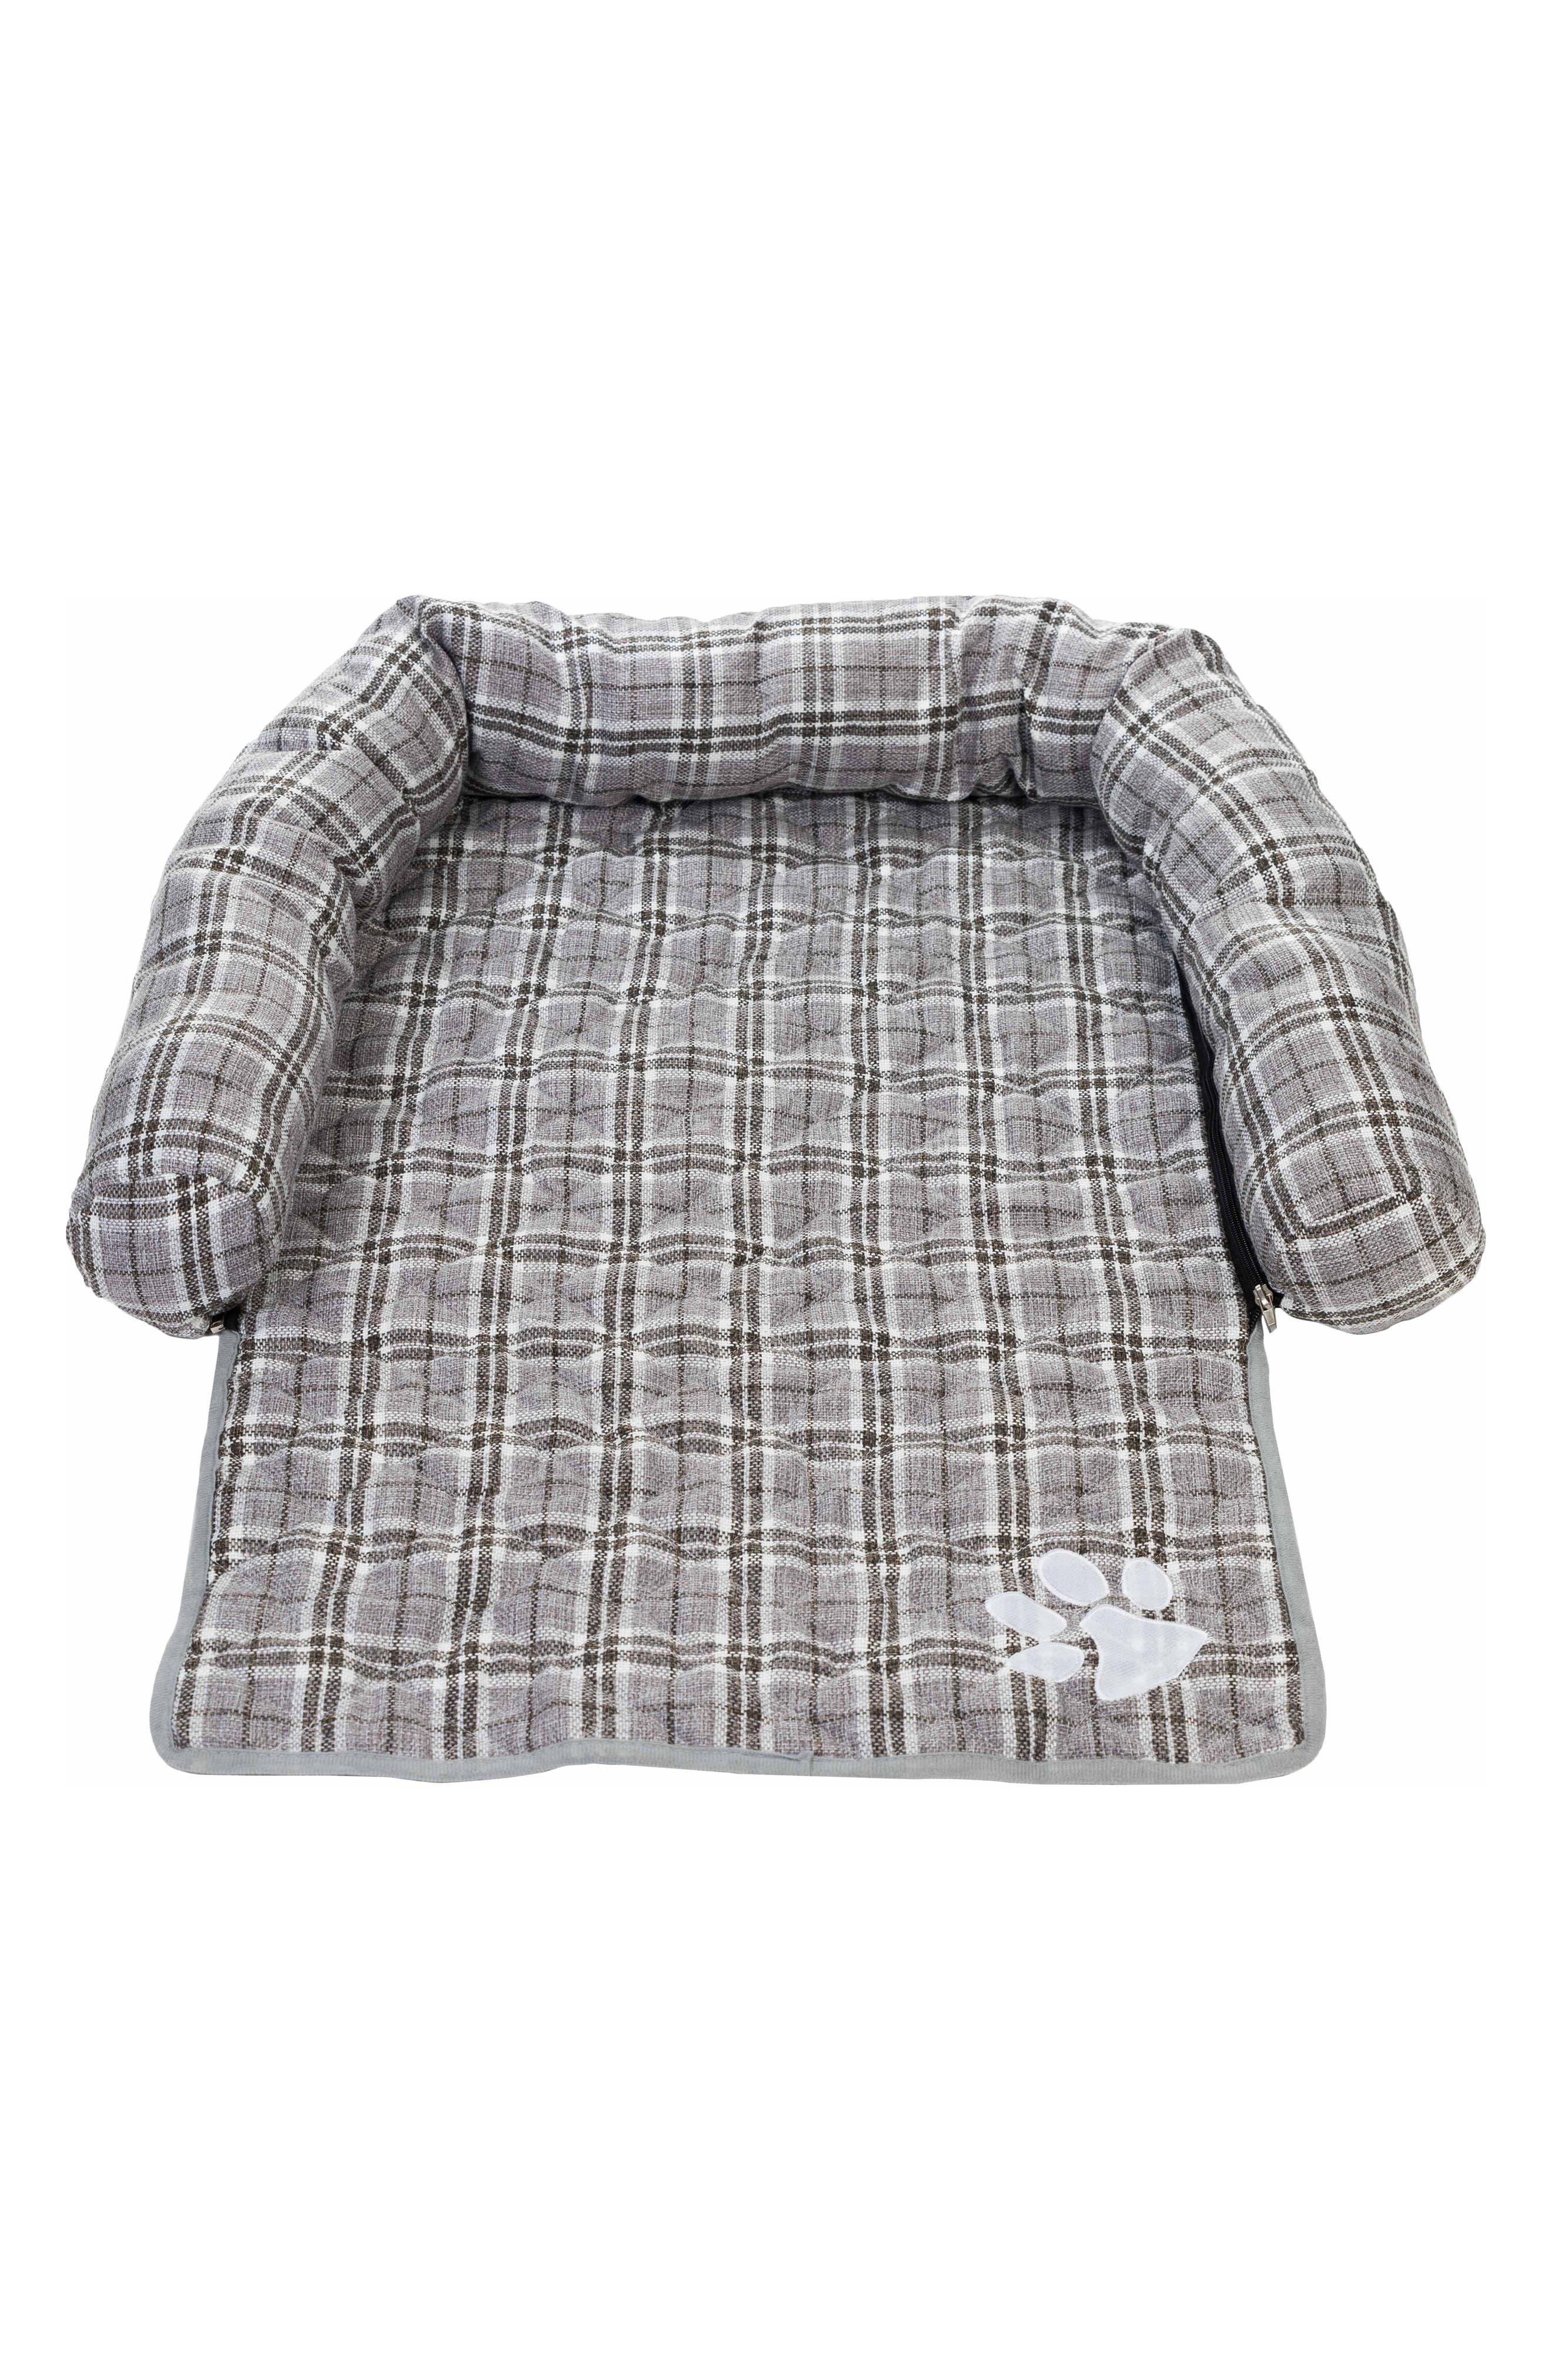 Harlee Reversible Pet Chair Cover,                             Main thumbnail 1, color,                             Grey